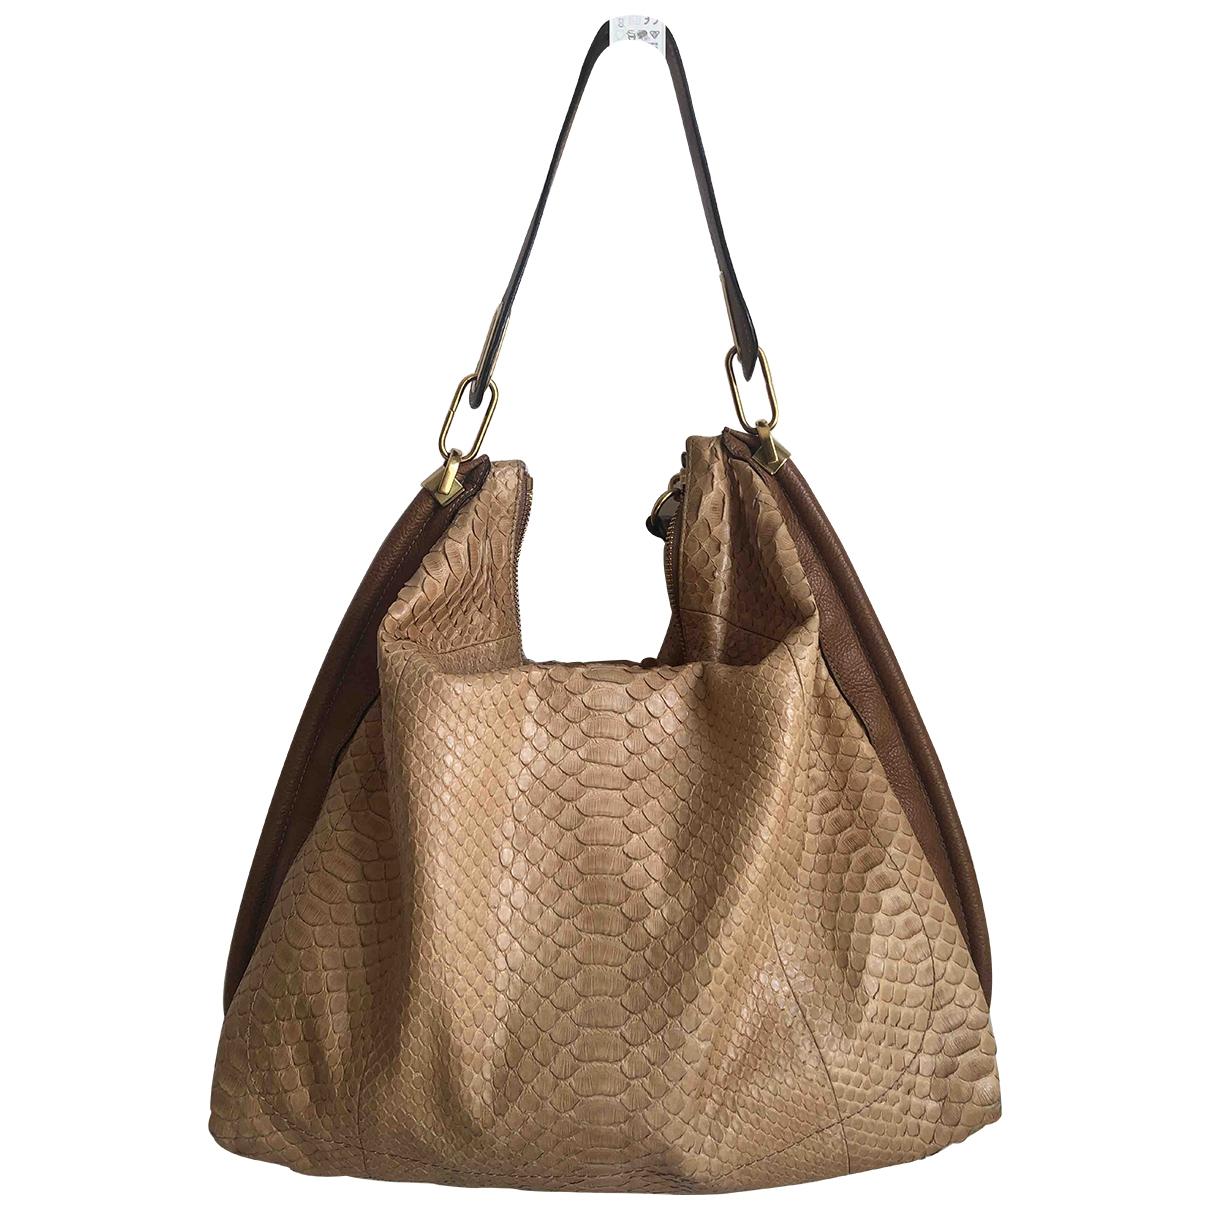 Chloé \N Beige Python handbag for Women \N